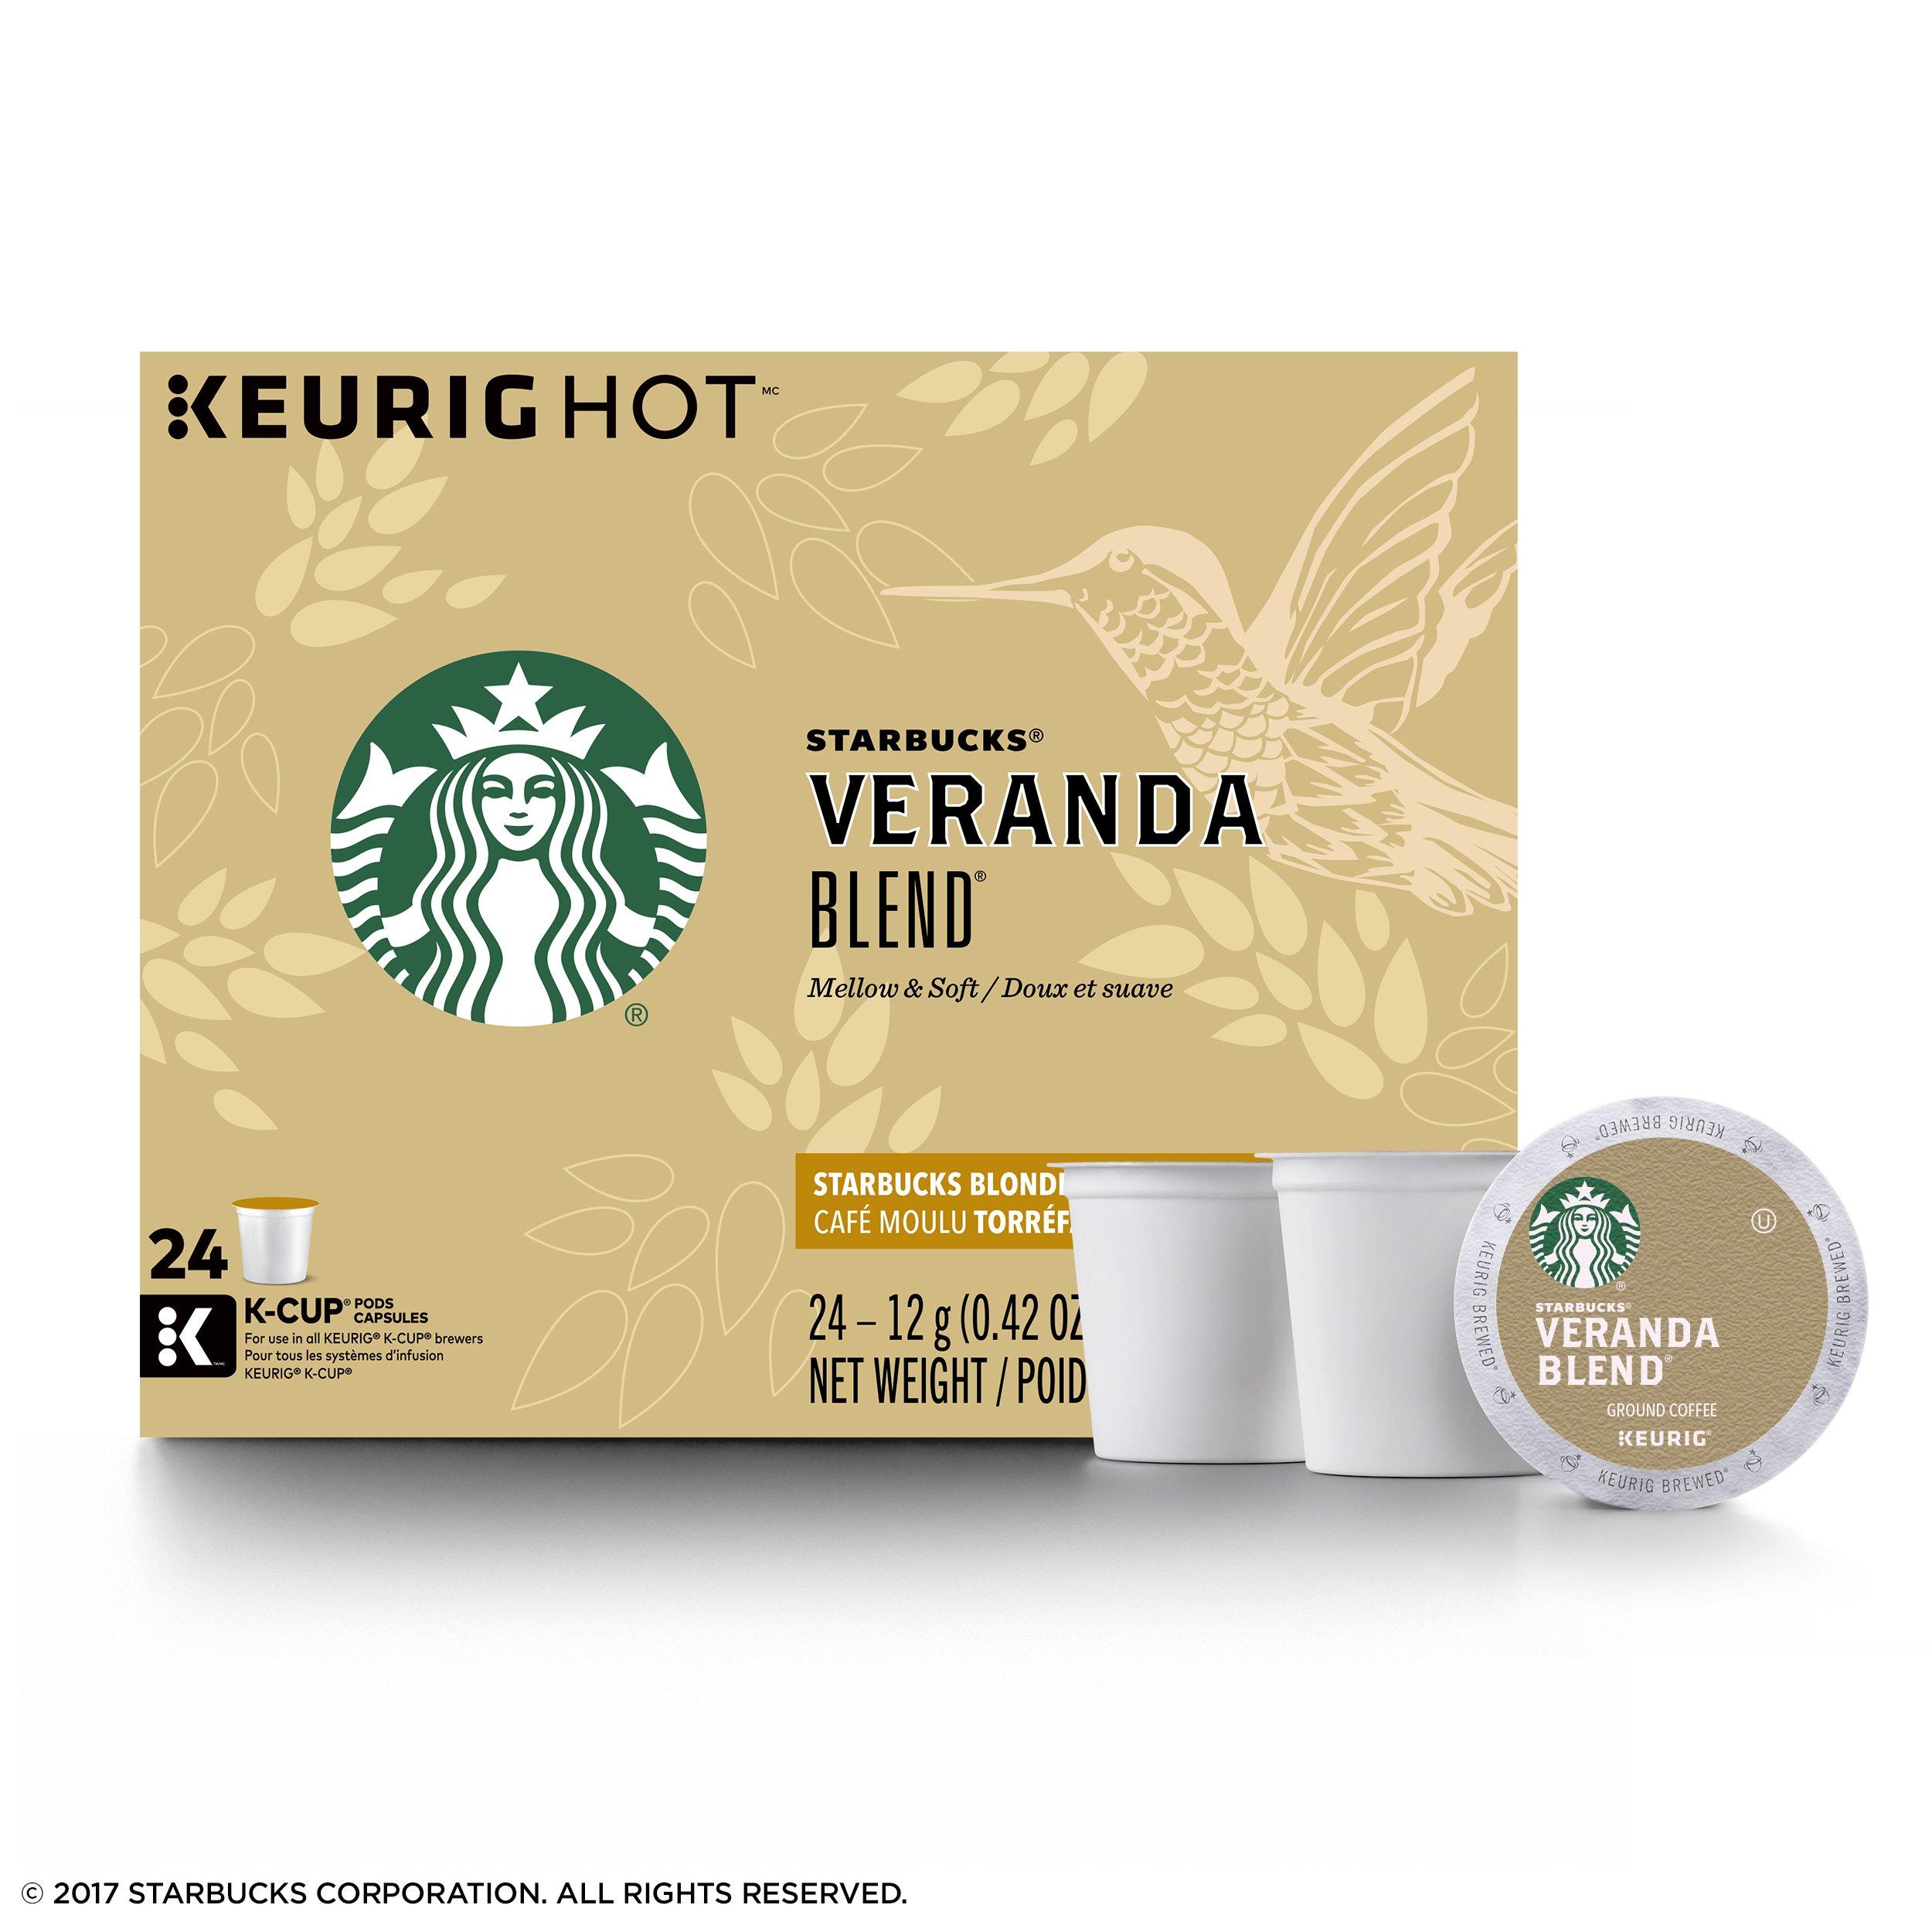 Starbucks Veranda Blend Blonde Light Roast Single Cup Coffee for Keurig Brewers, 1 Box of 24 (24 Total K-Cup pods)